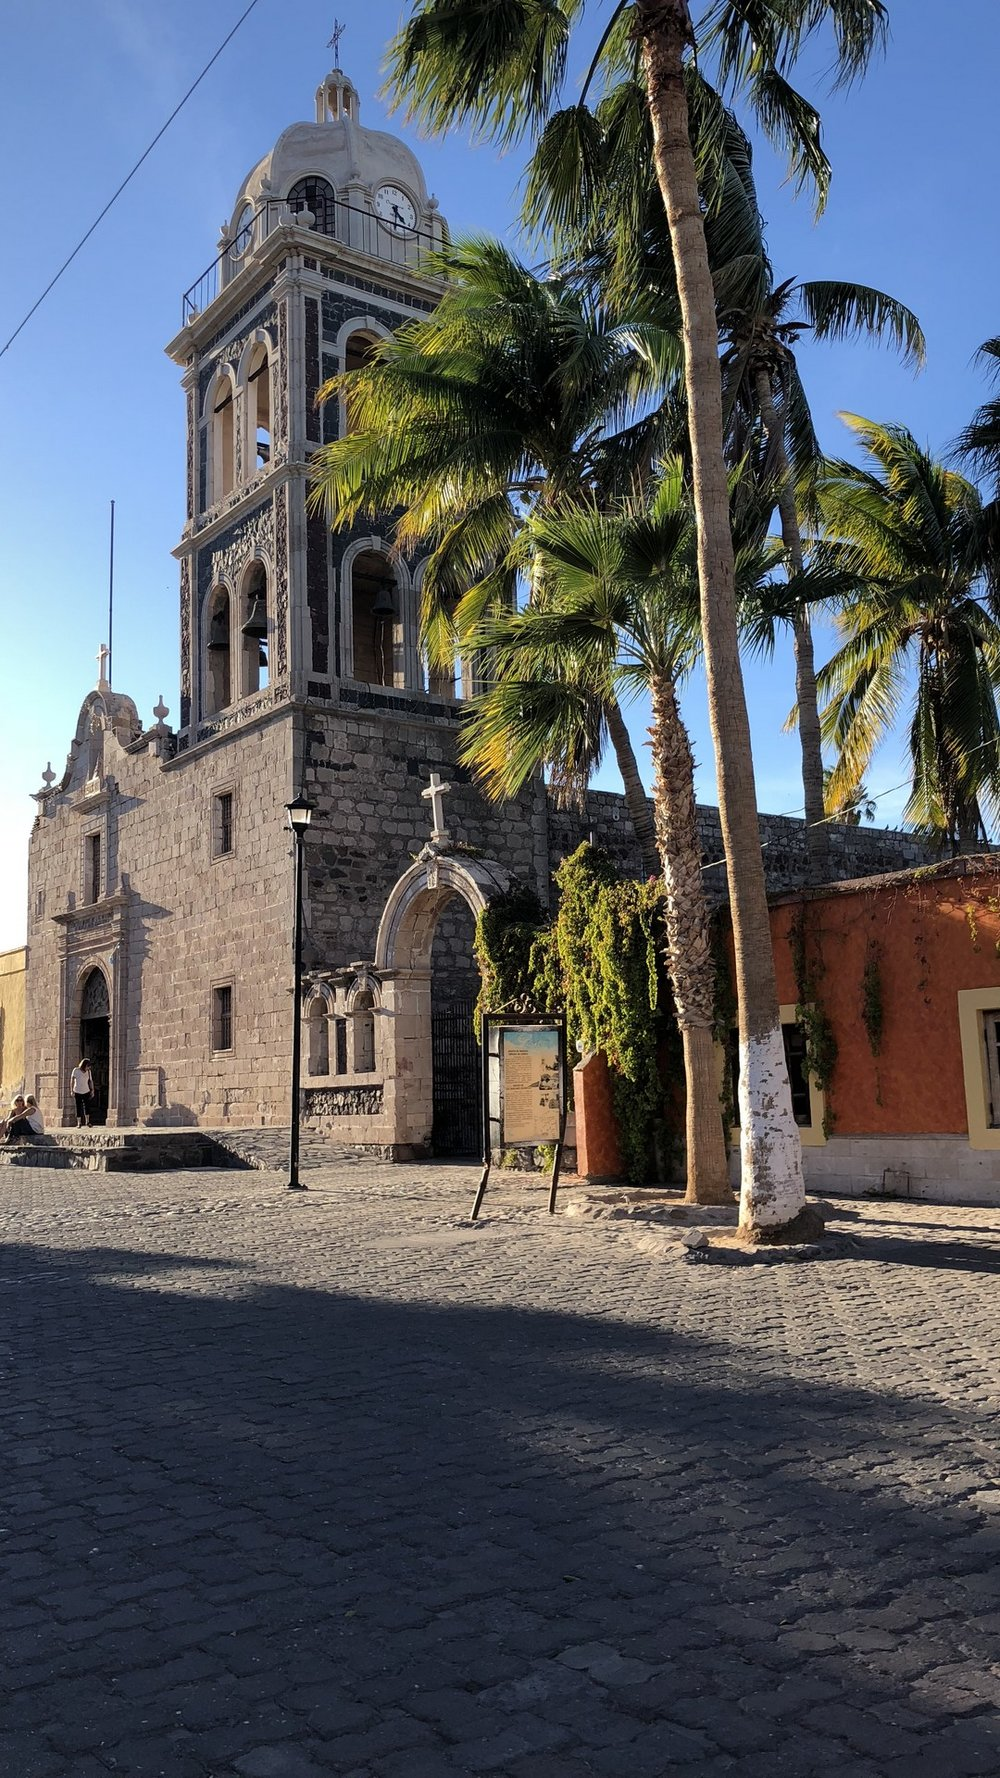 Among the City of Loreto's many colonial buildings is the historic Mision de Nuestra Senora de Loreto Concho, a 17th-century church (est. 1697).